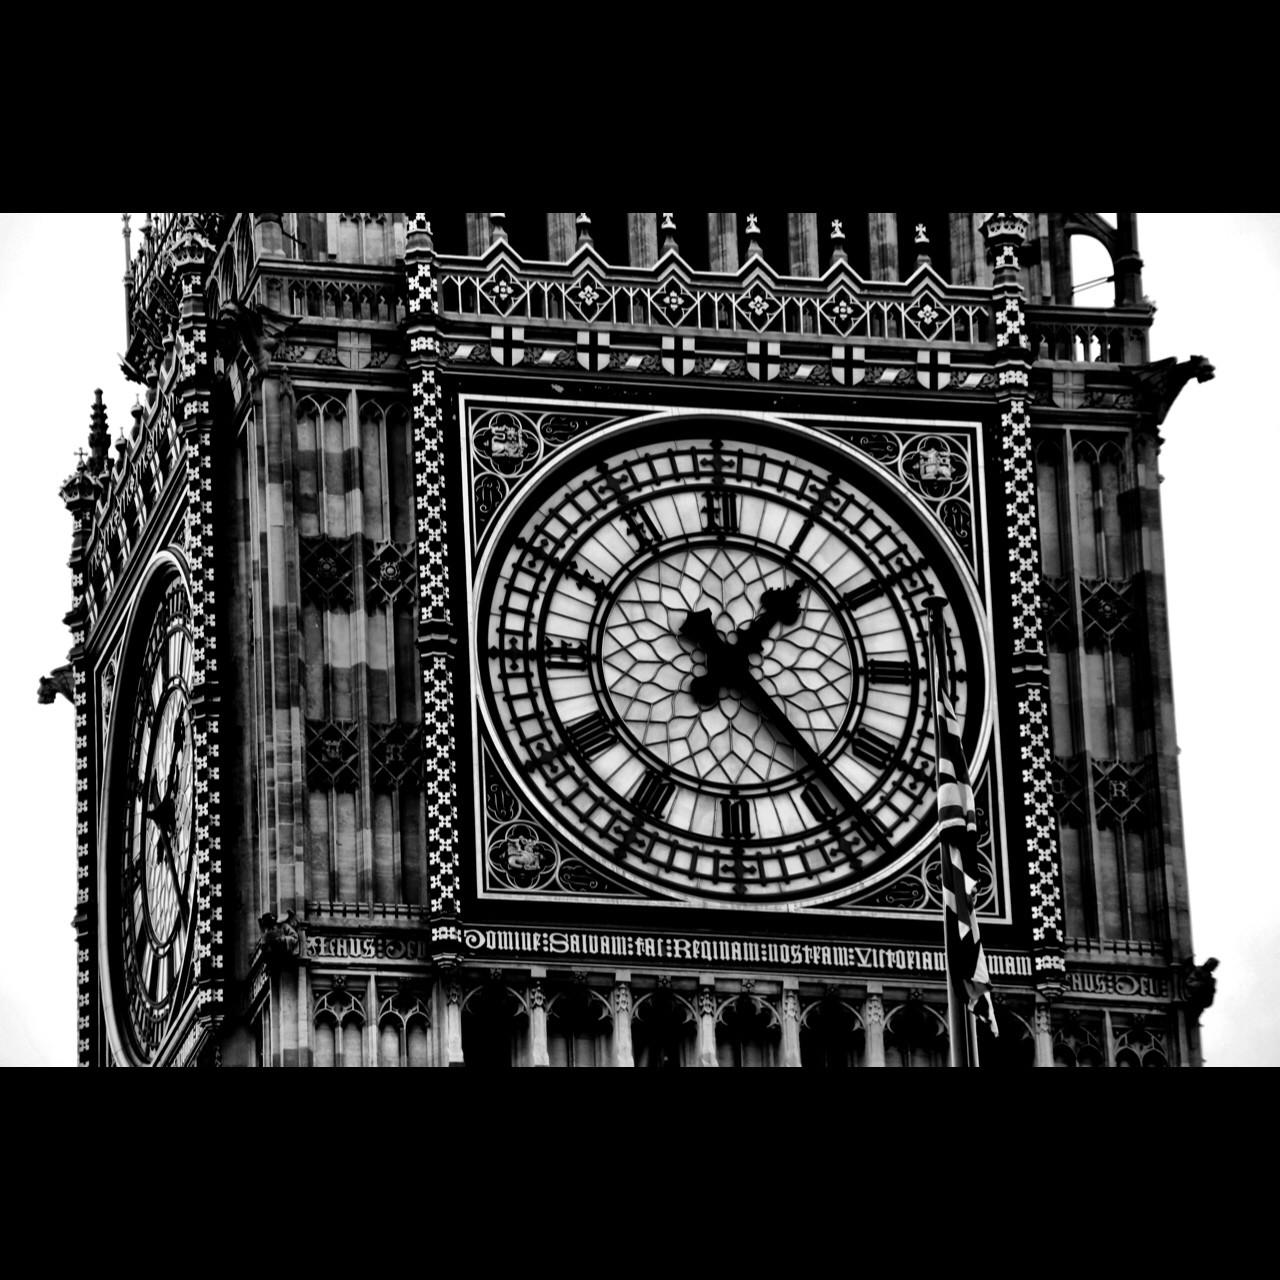 big-ben-queen-elisabeth-tower-5754a80adb